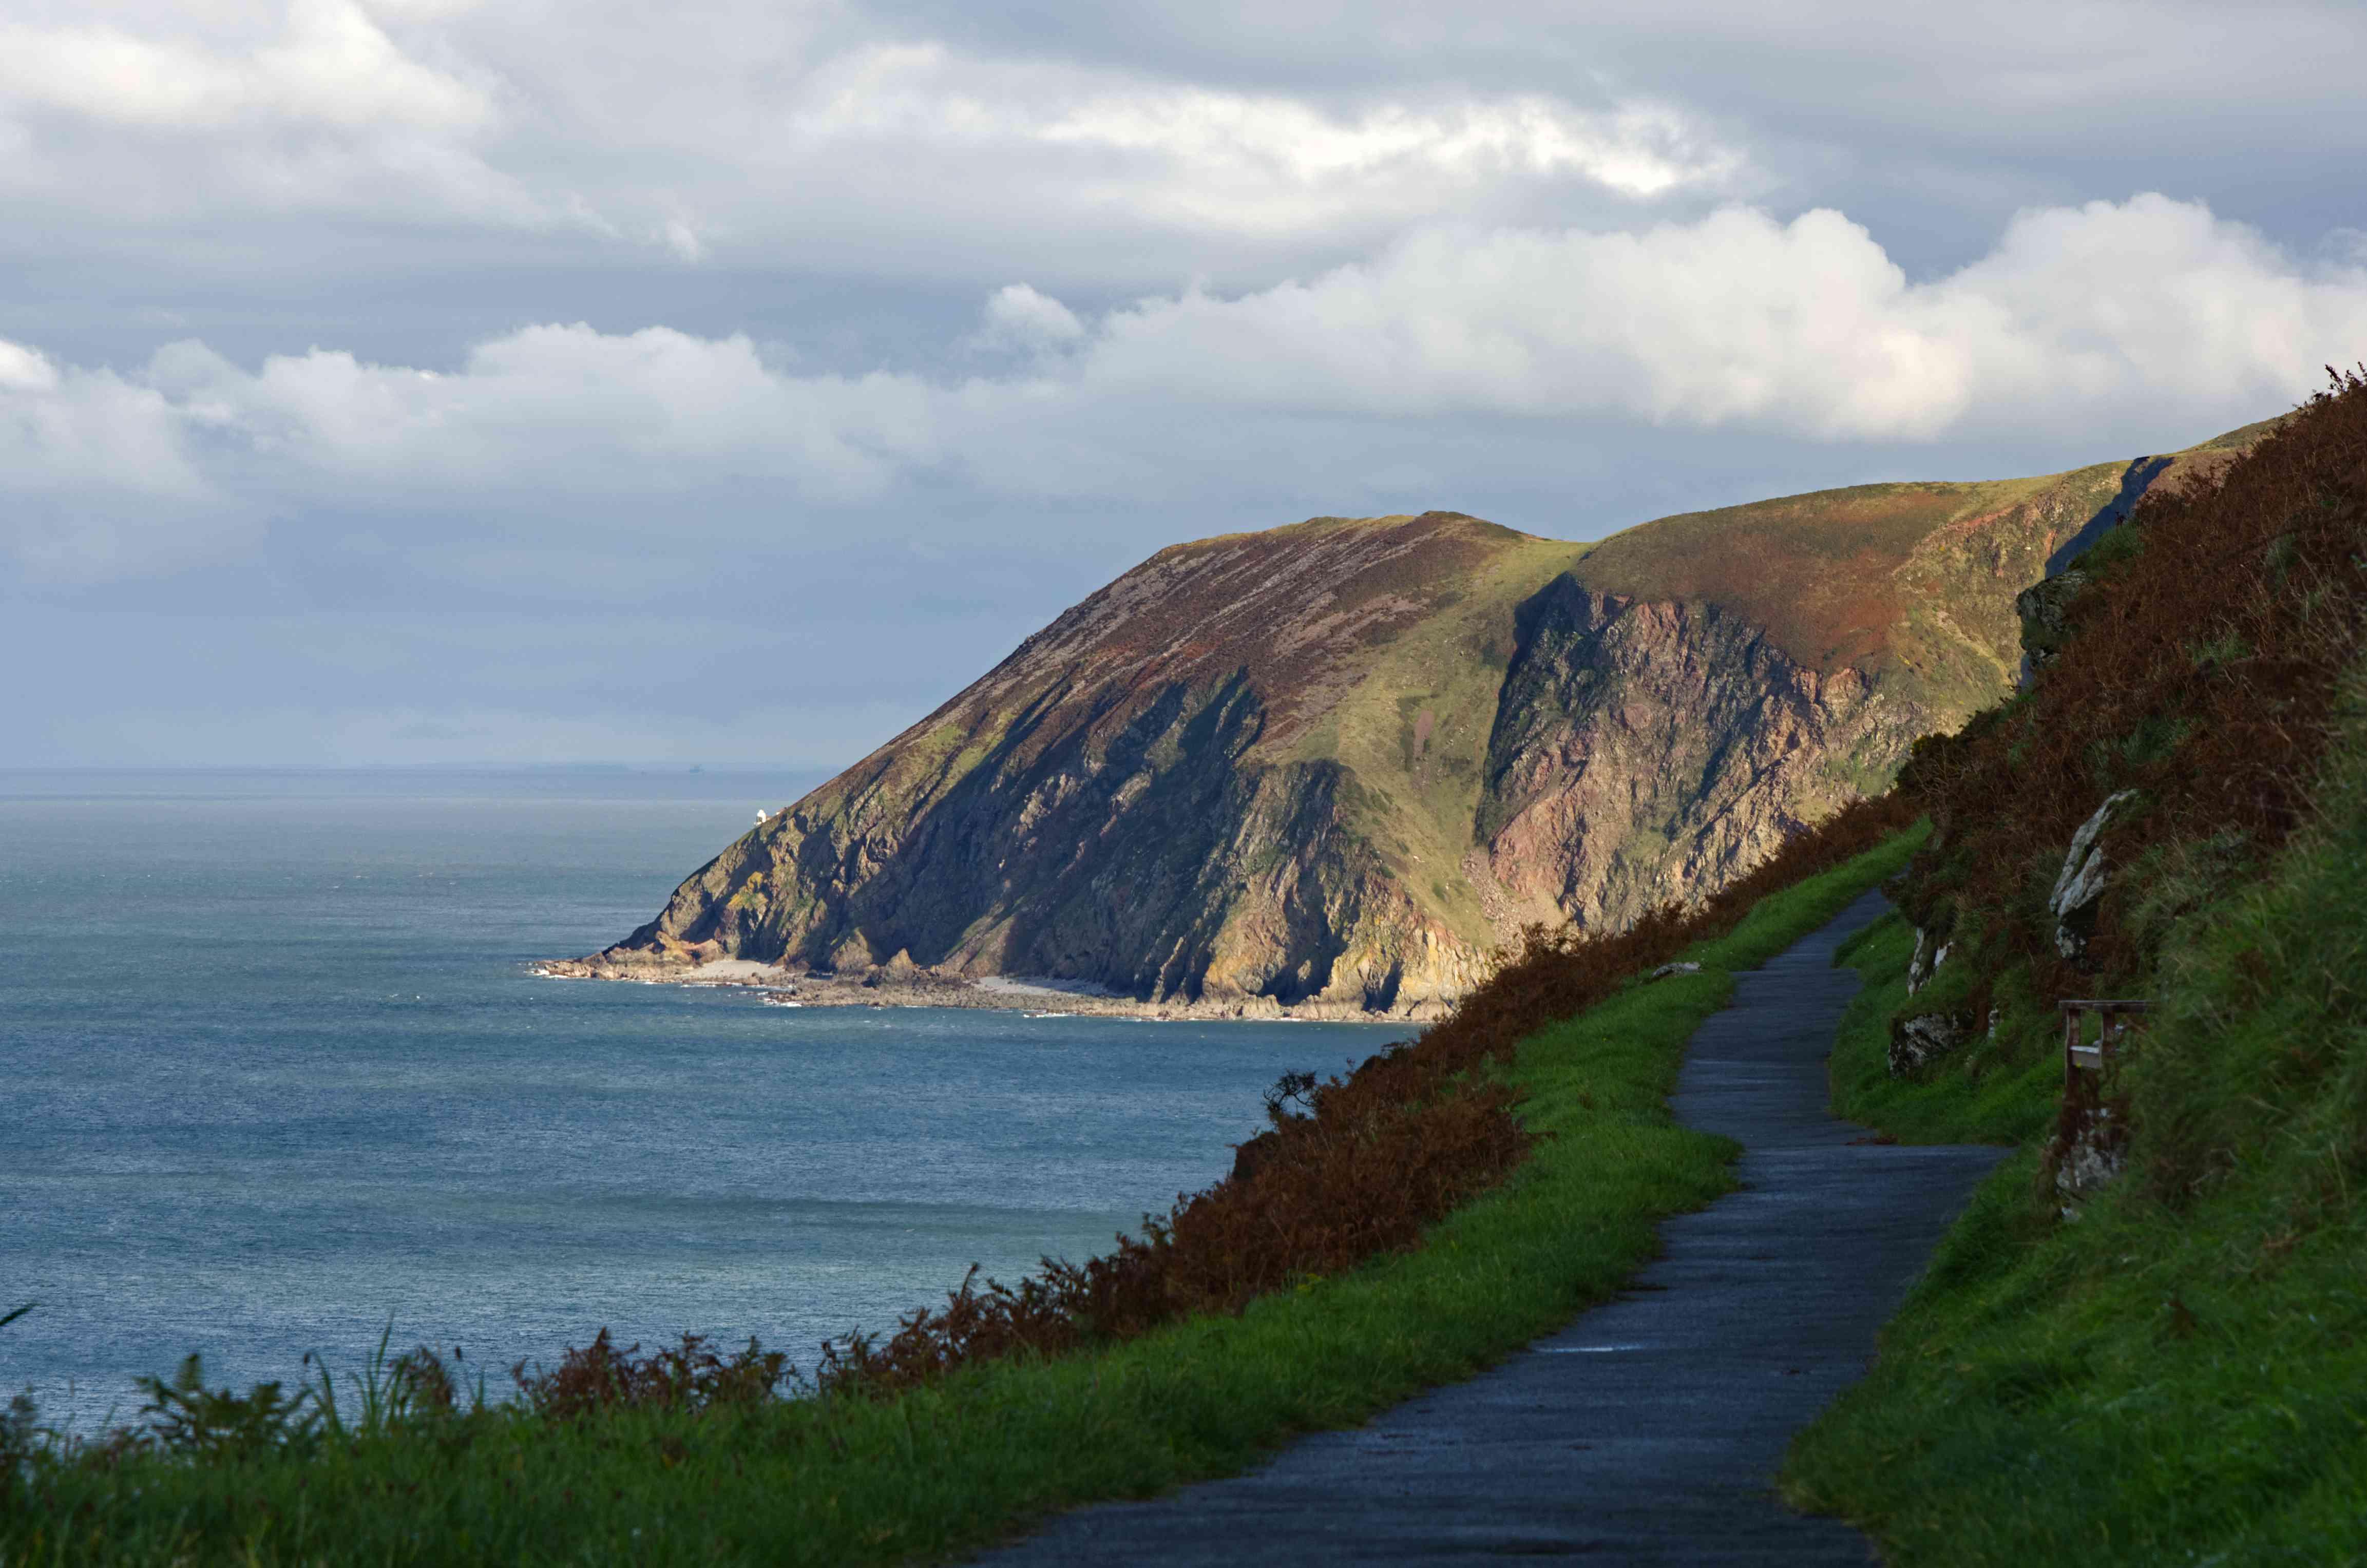 Cliff edge pathway near Lynton, Devon, England